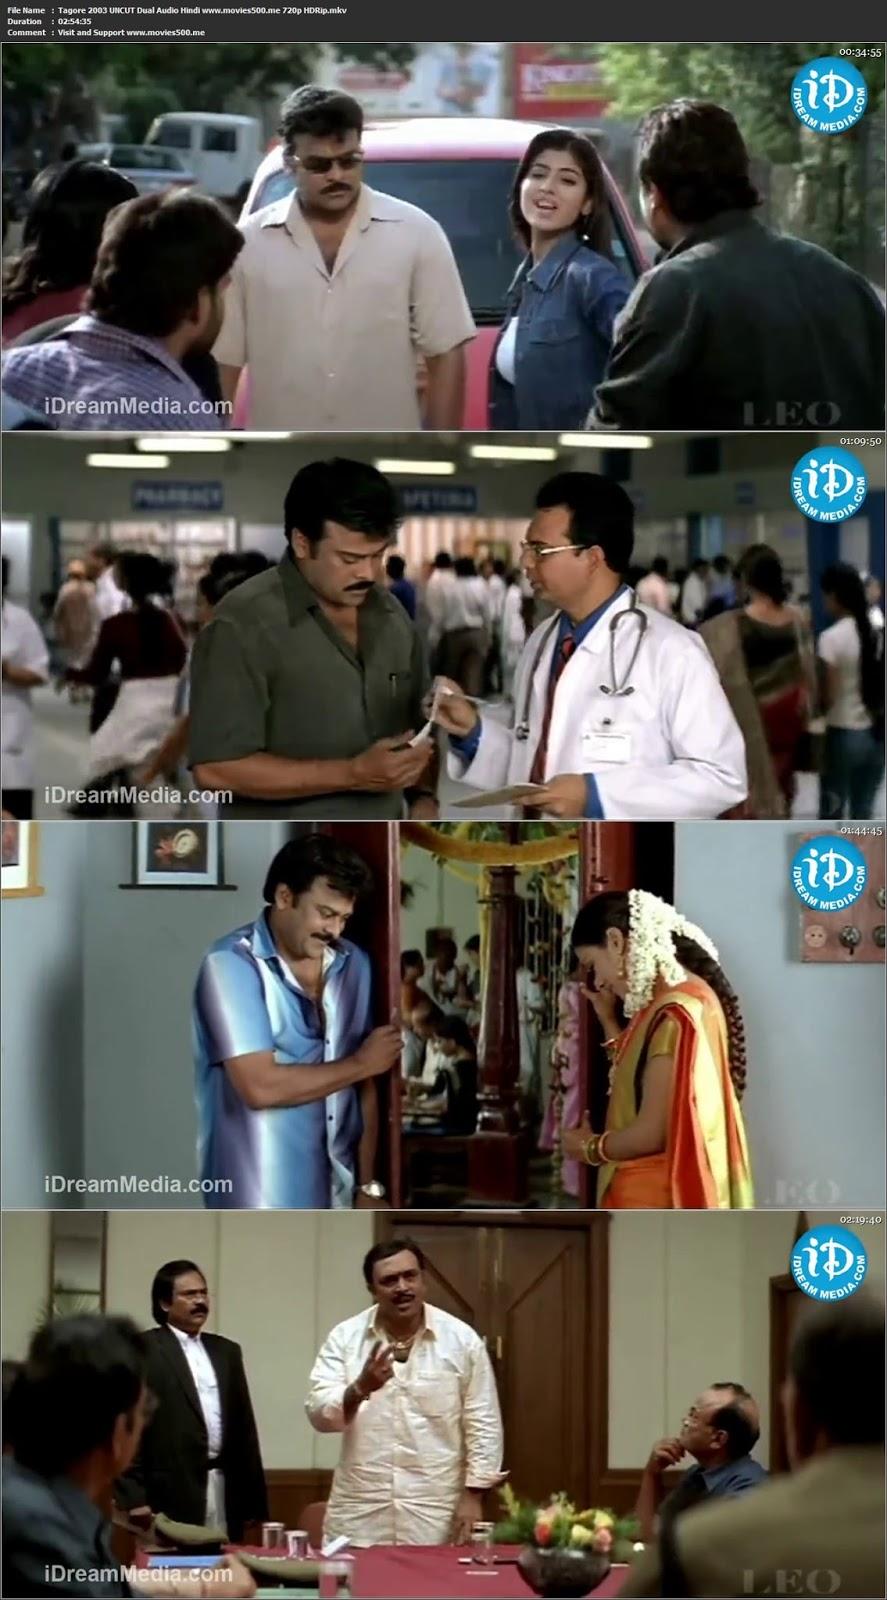 Tagore 2003 UNCUT Dual Audio Hindi Full Movie HDRip 720p at softwaresonly.com